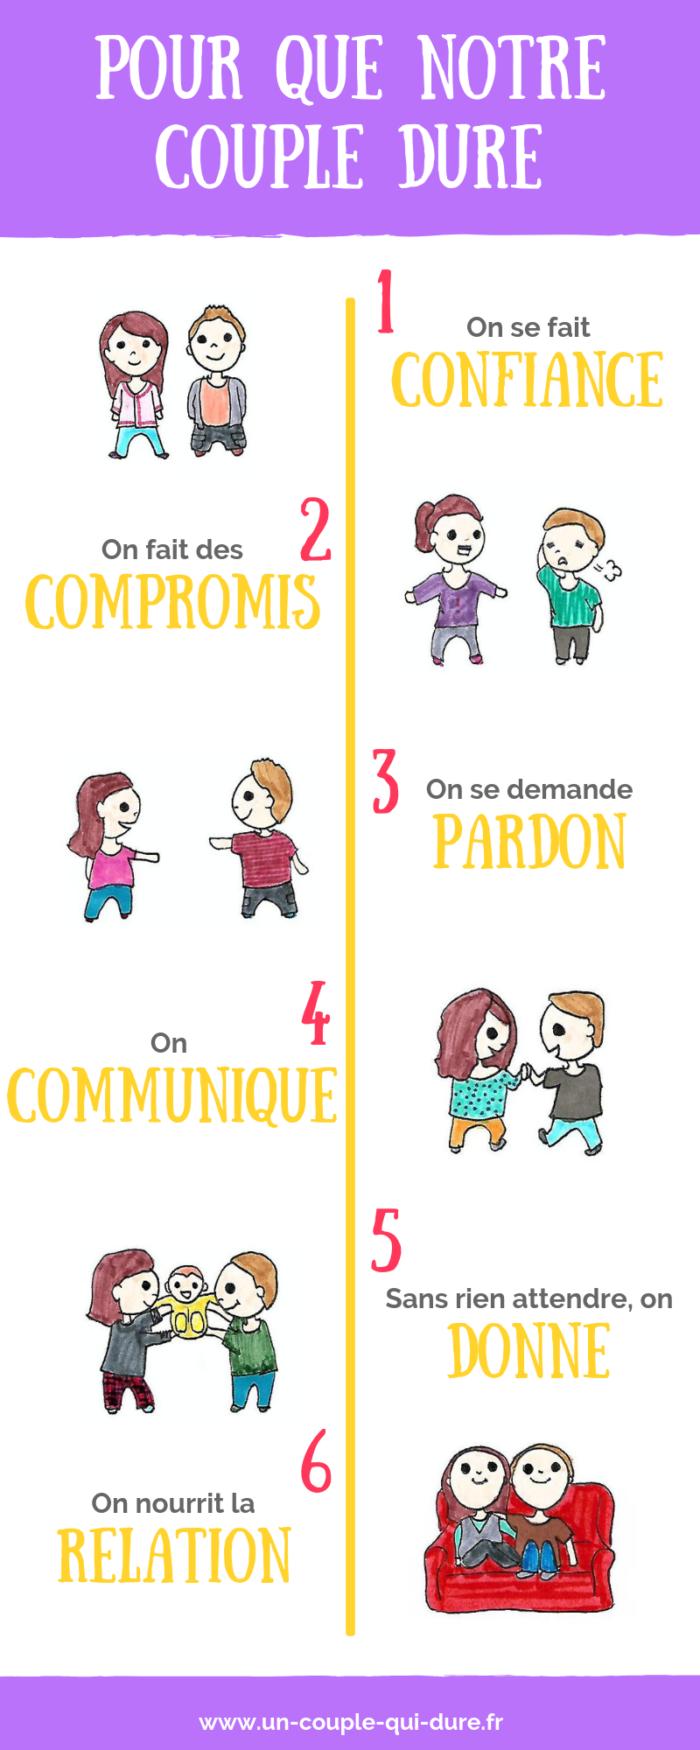 infographie couple qui dure